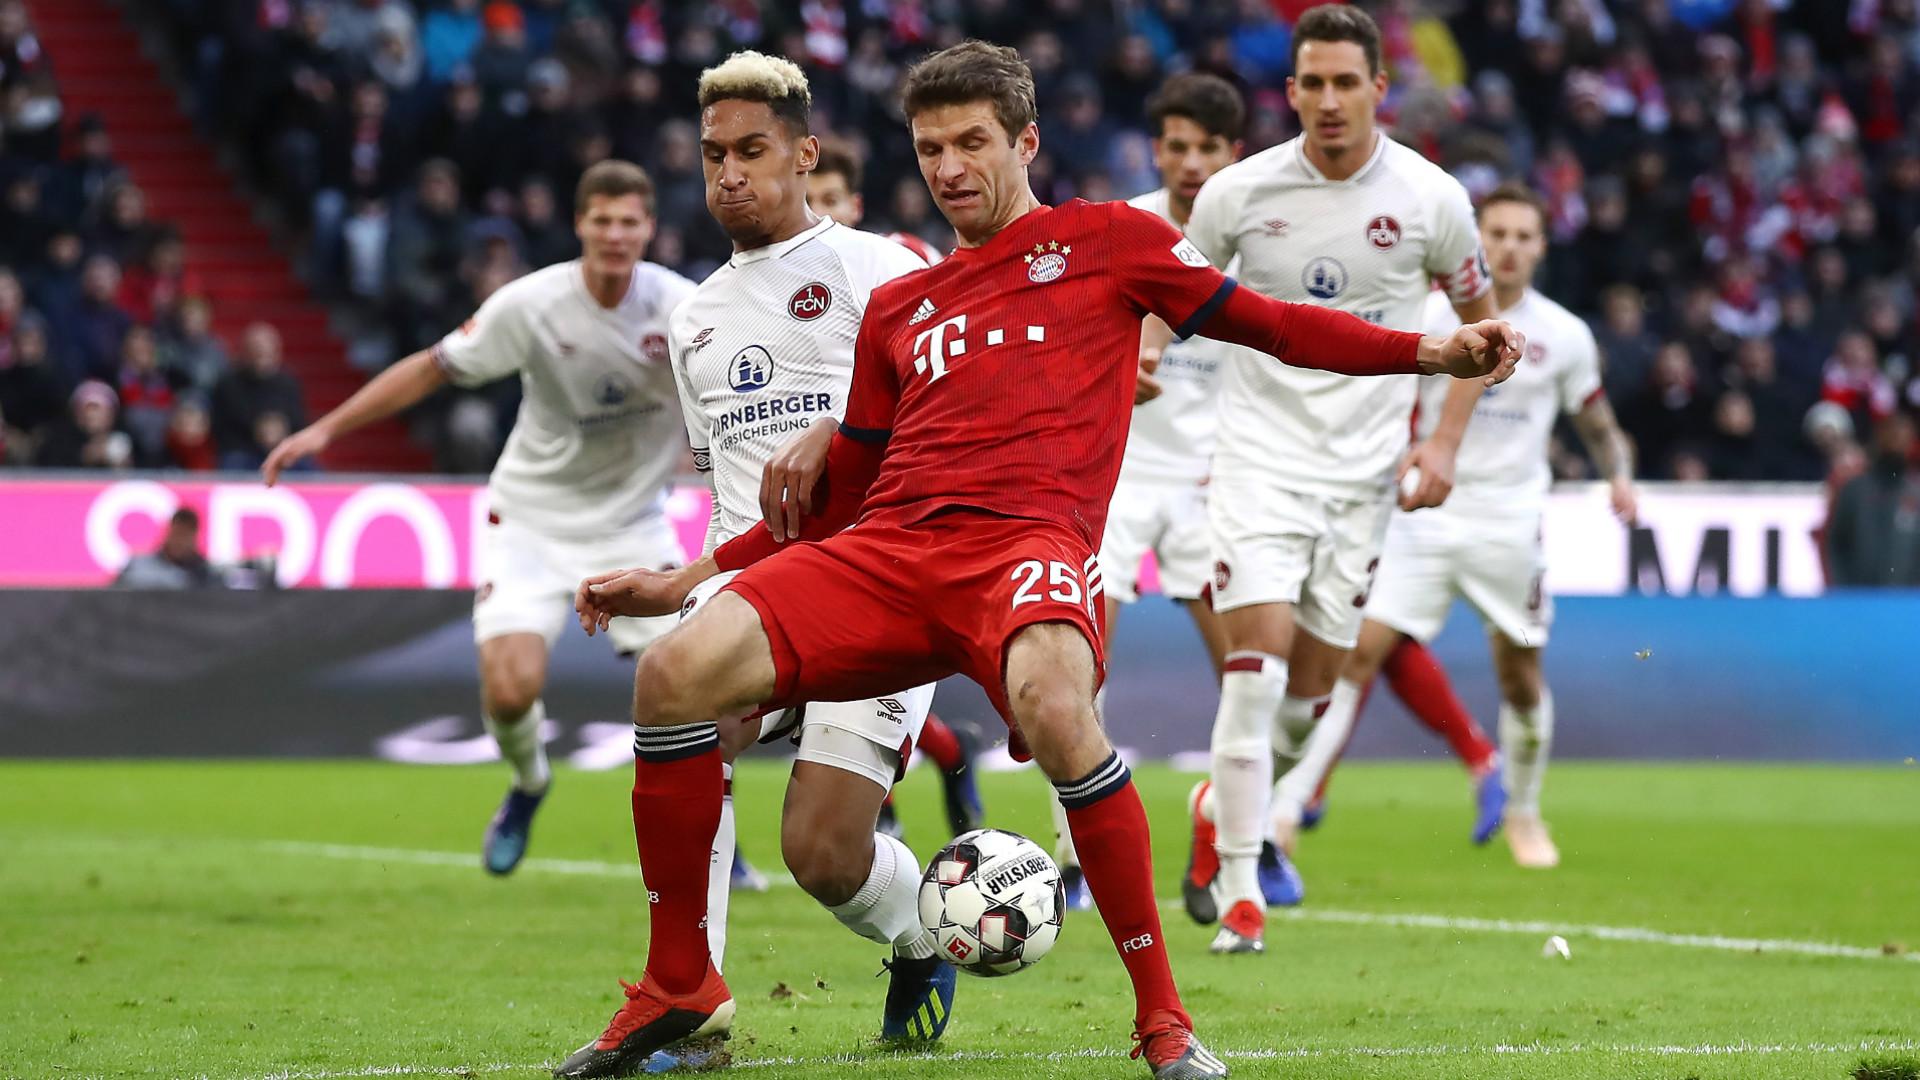 Thomas Muller Kevin Goden Bayern Munchen 1 FC Nurnberg Bundesliga 08122018